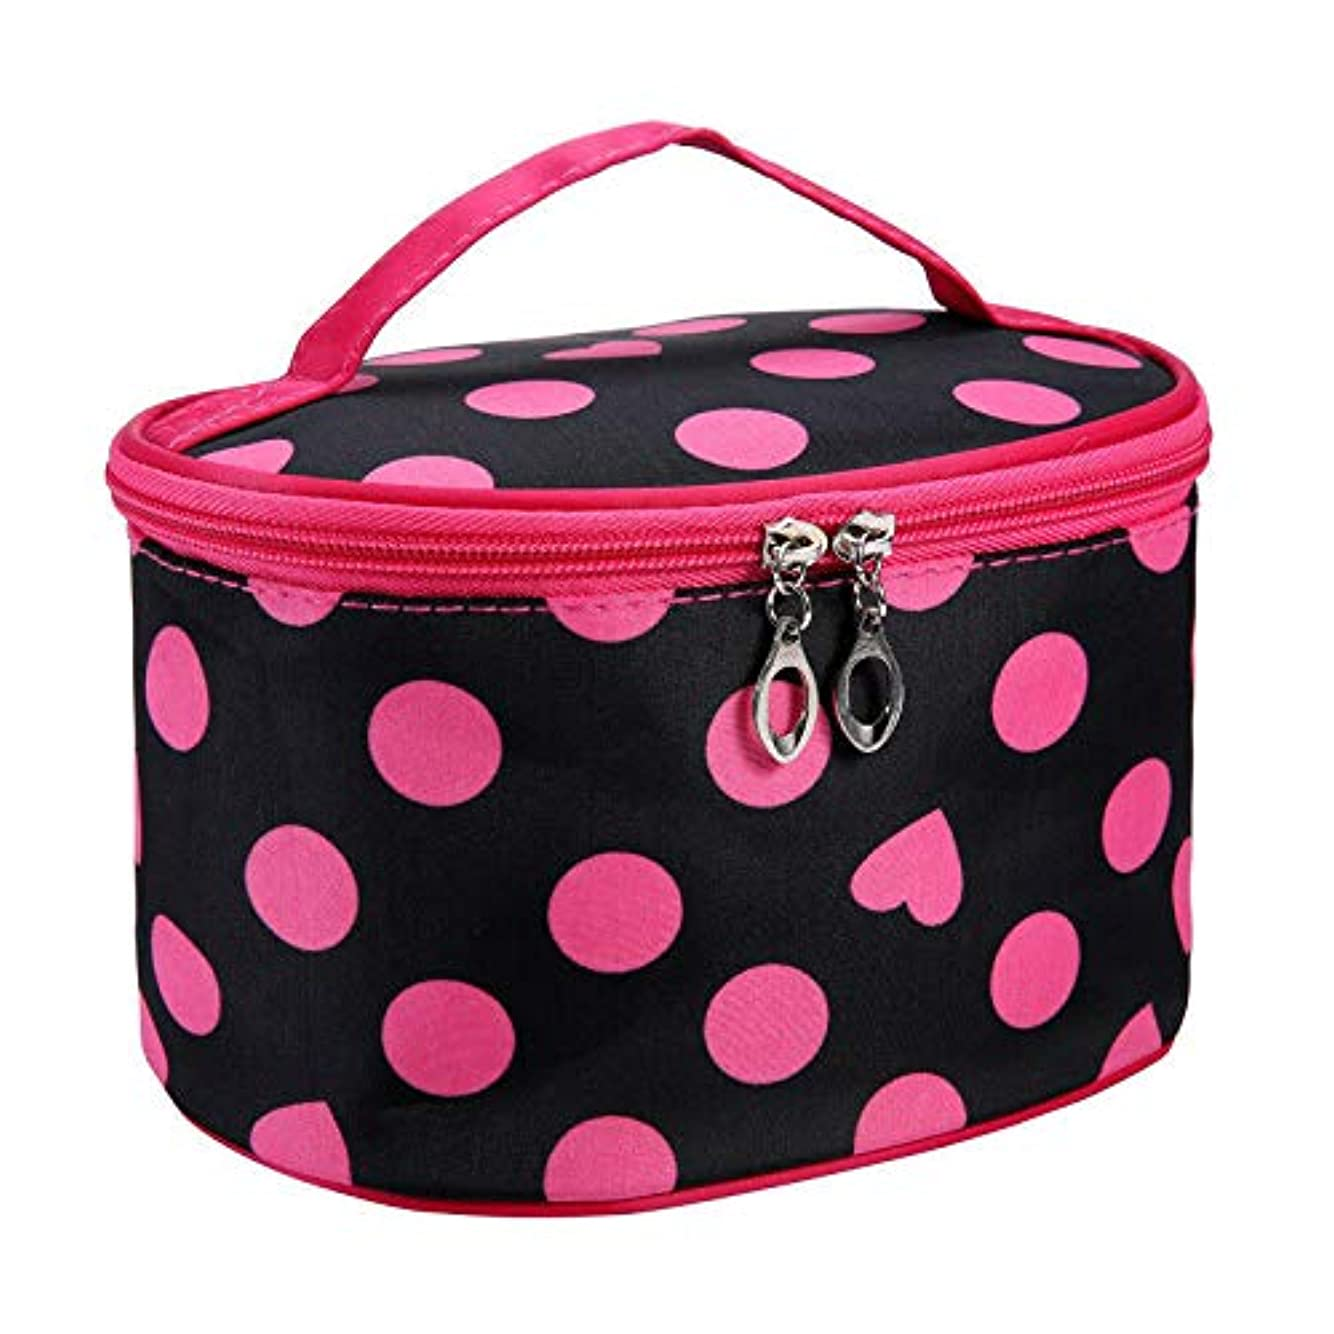 FidgetGear Women's Multifunction Travel Cosmetic Bag Makeup Case Pouch Toiletry Organizer Hot Pink